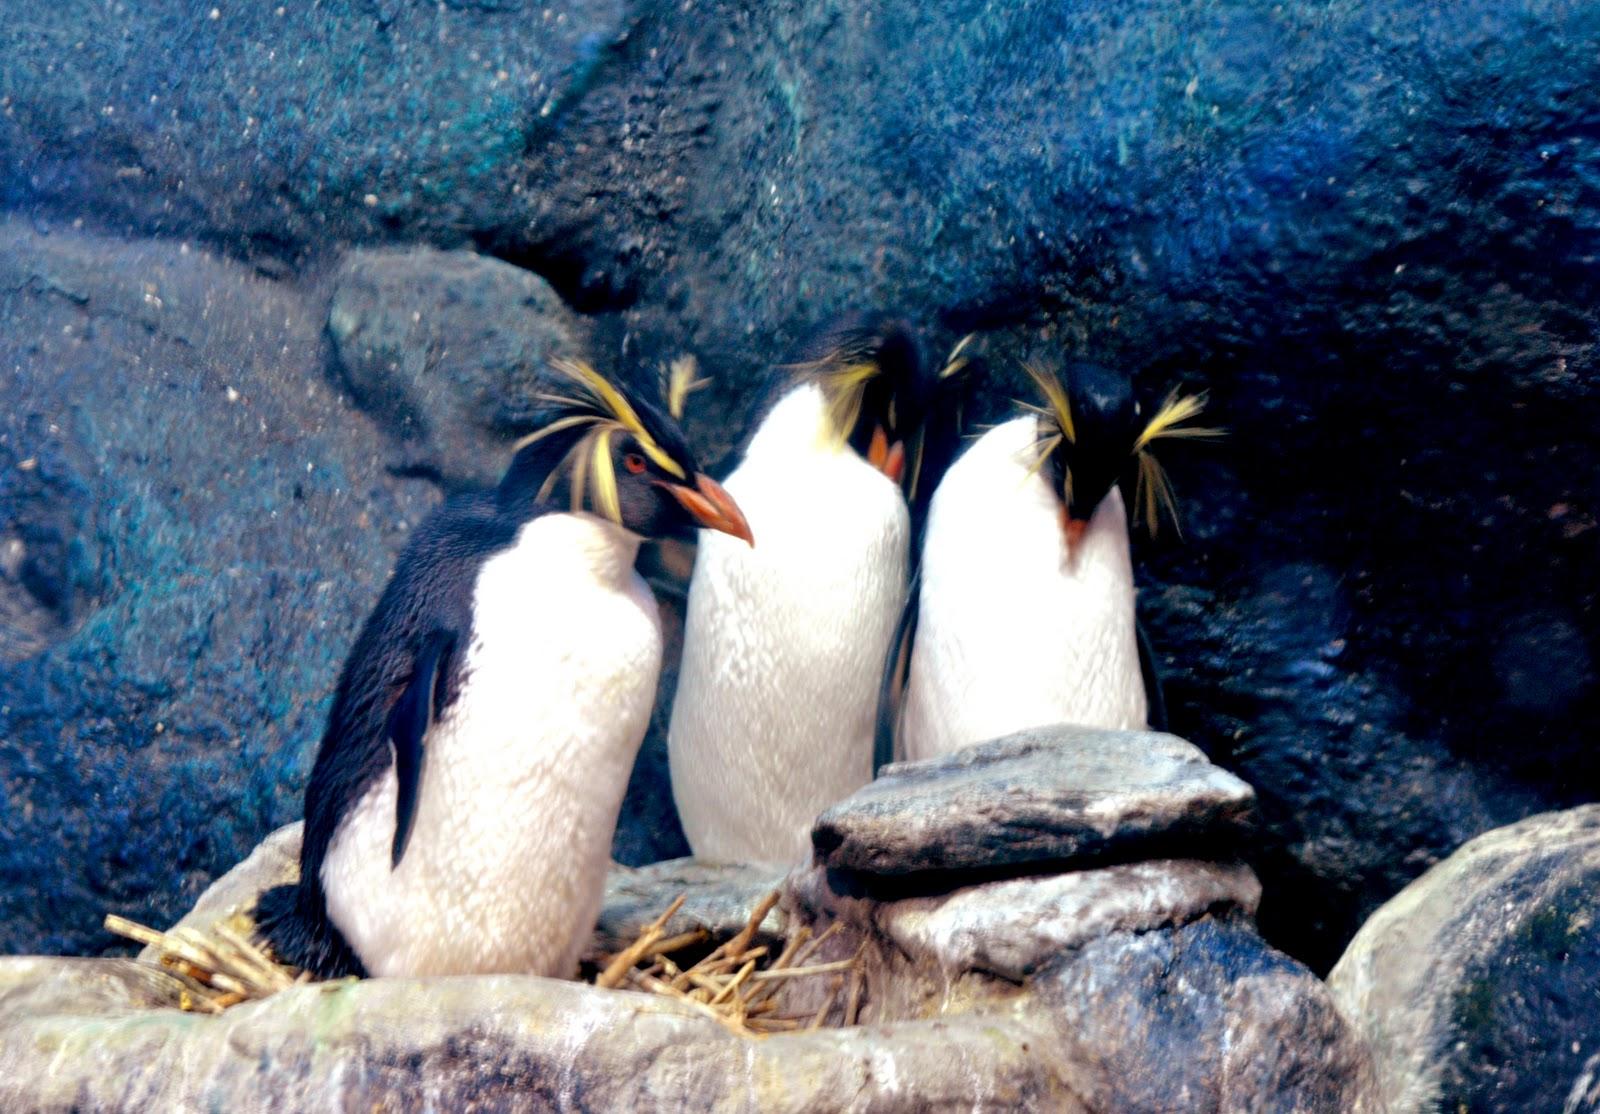 Underwater World Langkawi : Langkawi Ink.Com: Rockhopper : The Penguinarium Underwater World ...